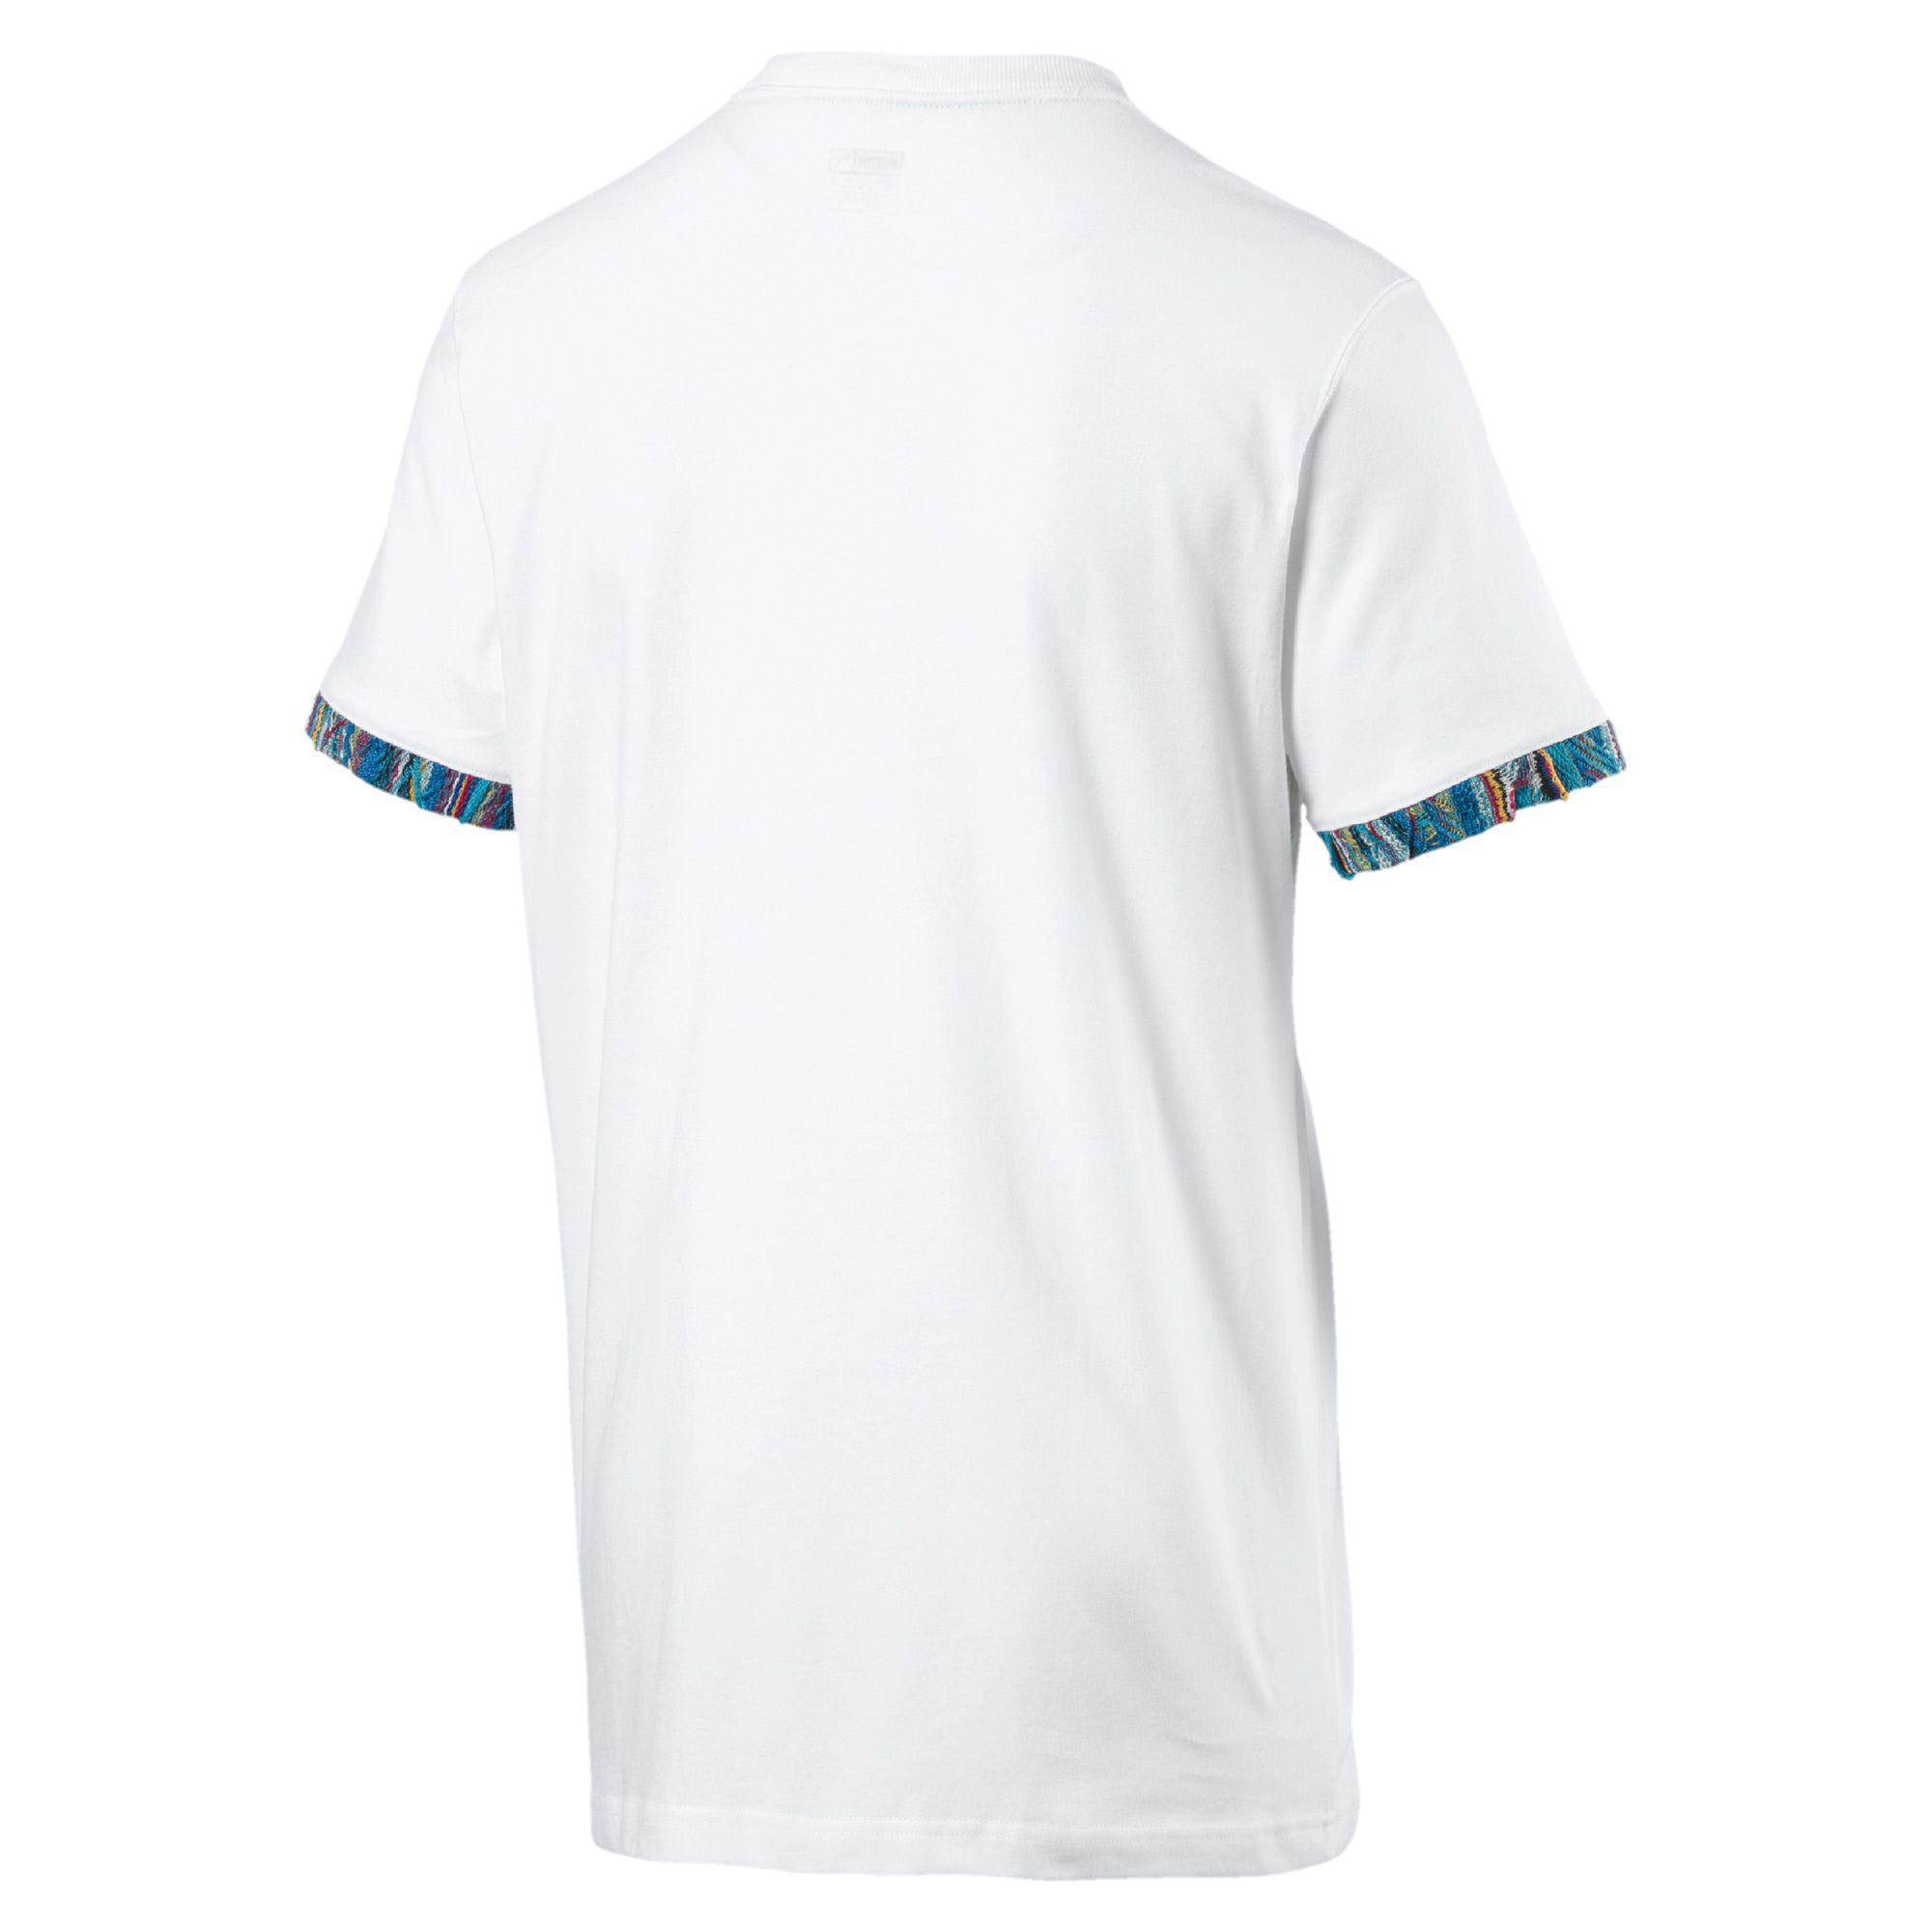 b12d561c190 ... Lyst PUMA X Coogi Logo T shirt in Blue for Men Save View fullscreen  Source · Puma X Coogi Sneaker Tongue Printed Black Tee Shirt Mens 2xl Ebay